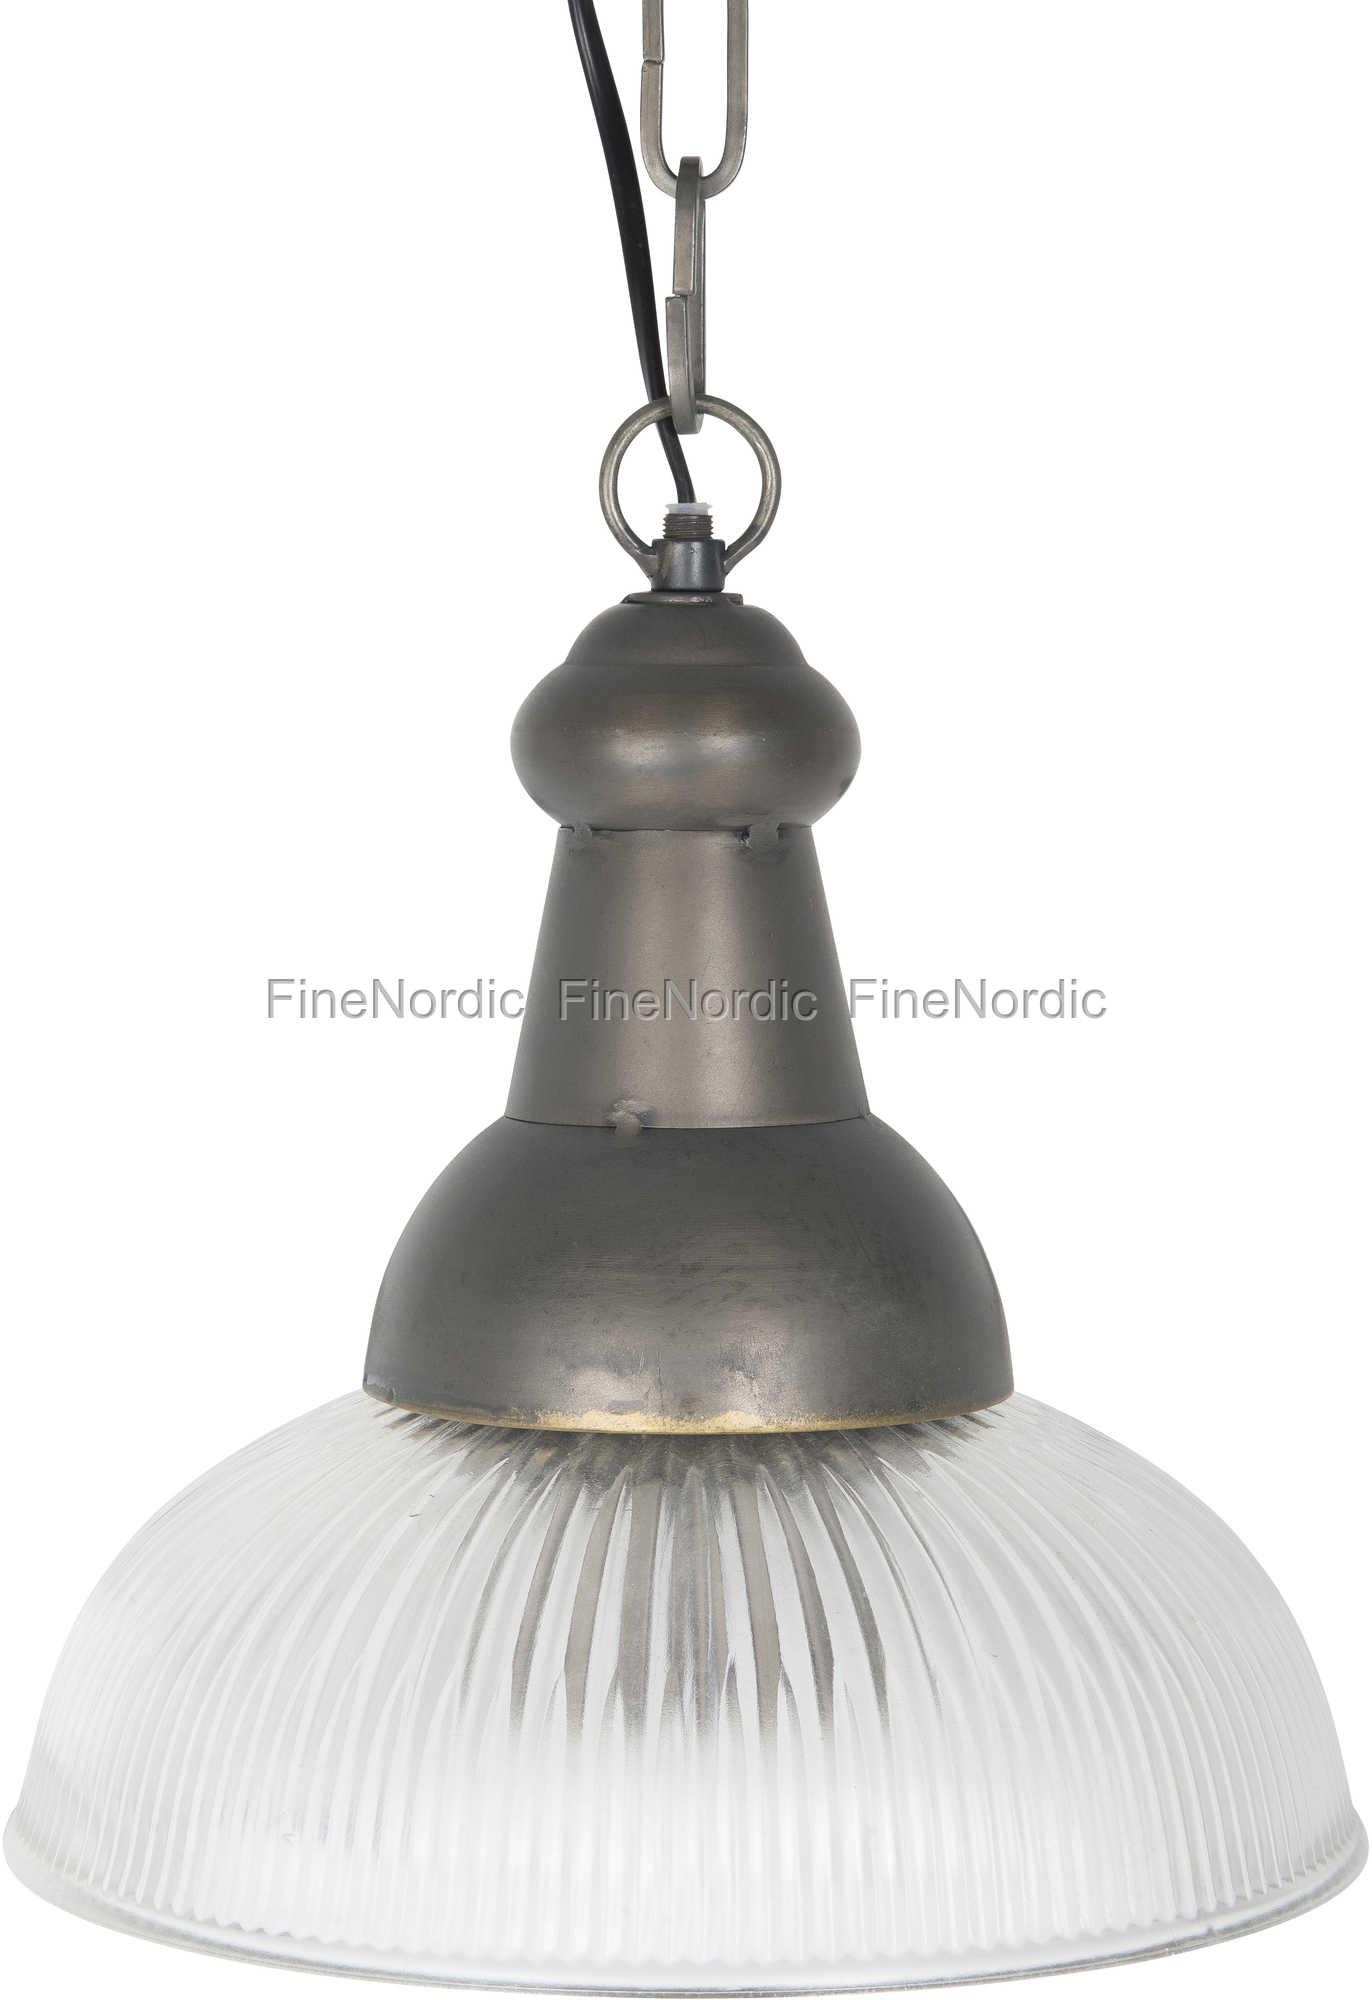 Udestående Ib Laursen Lampe Gerillter Schirm NC41